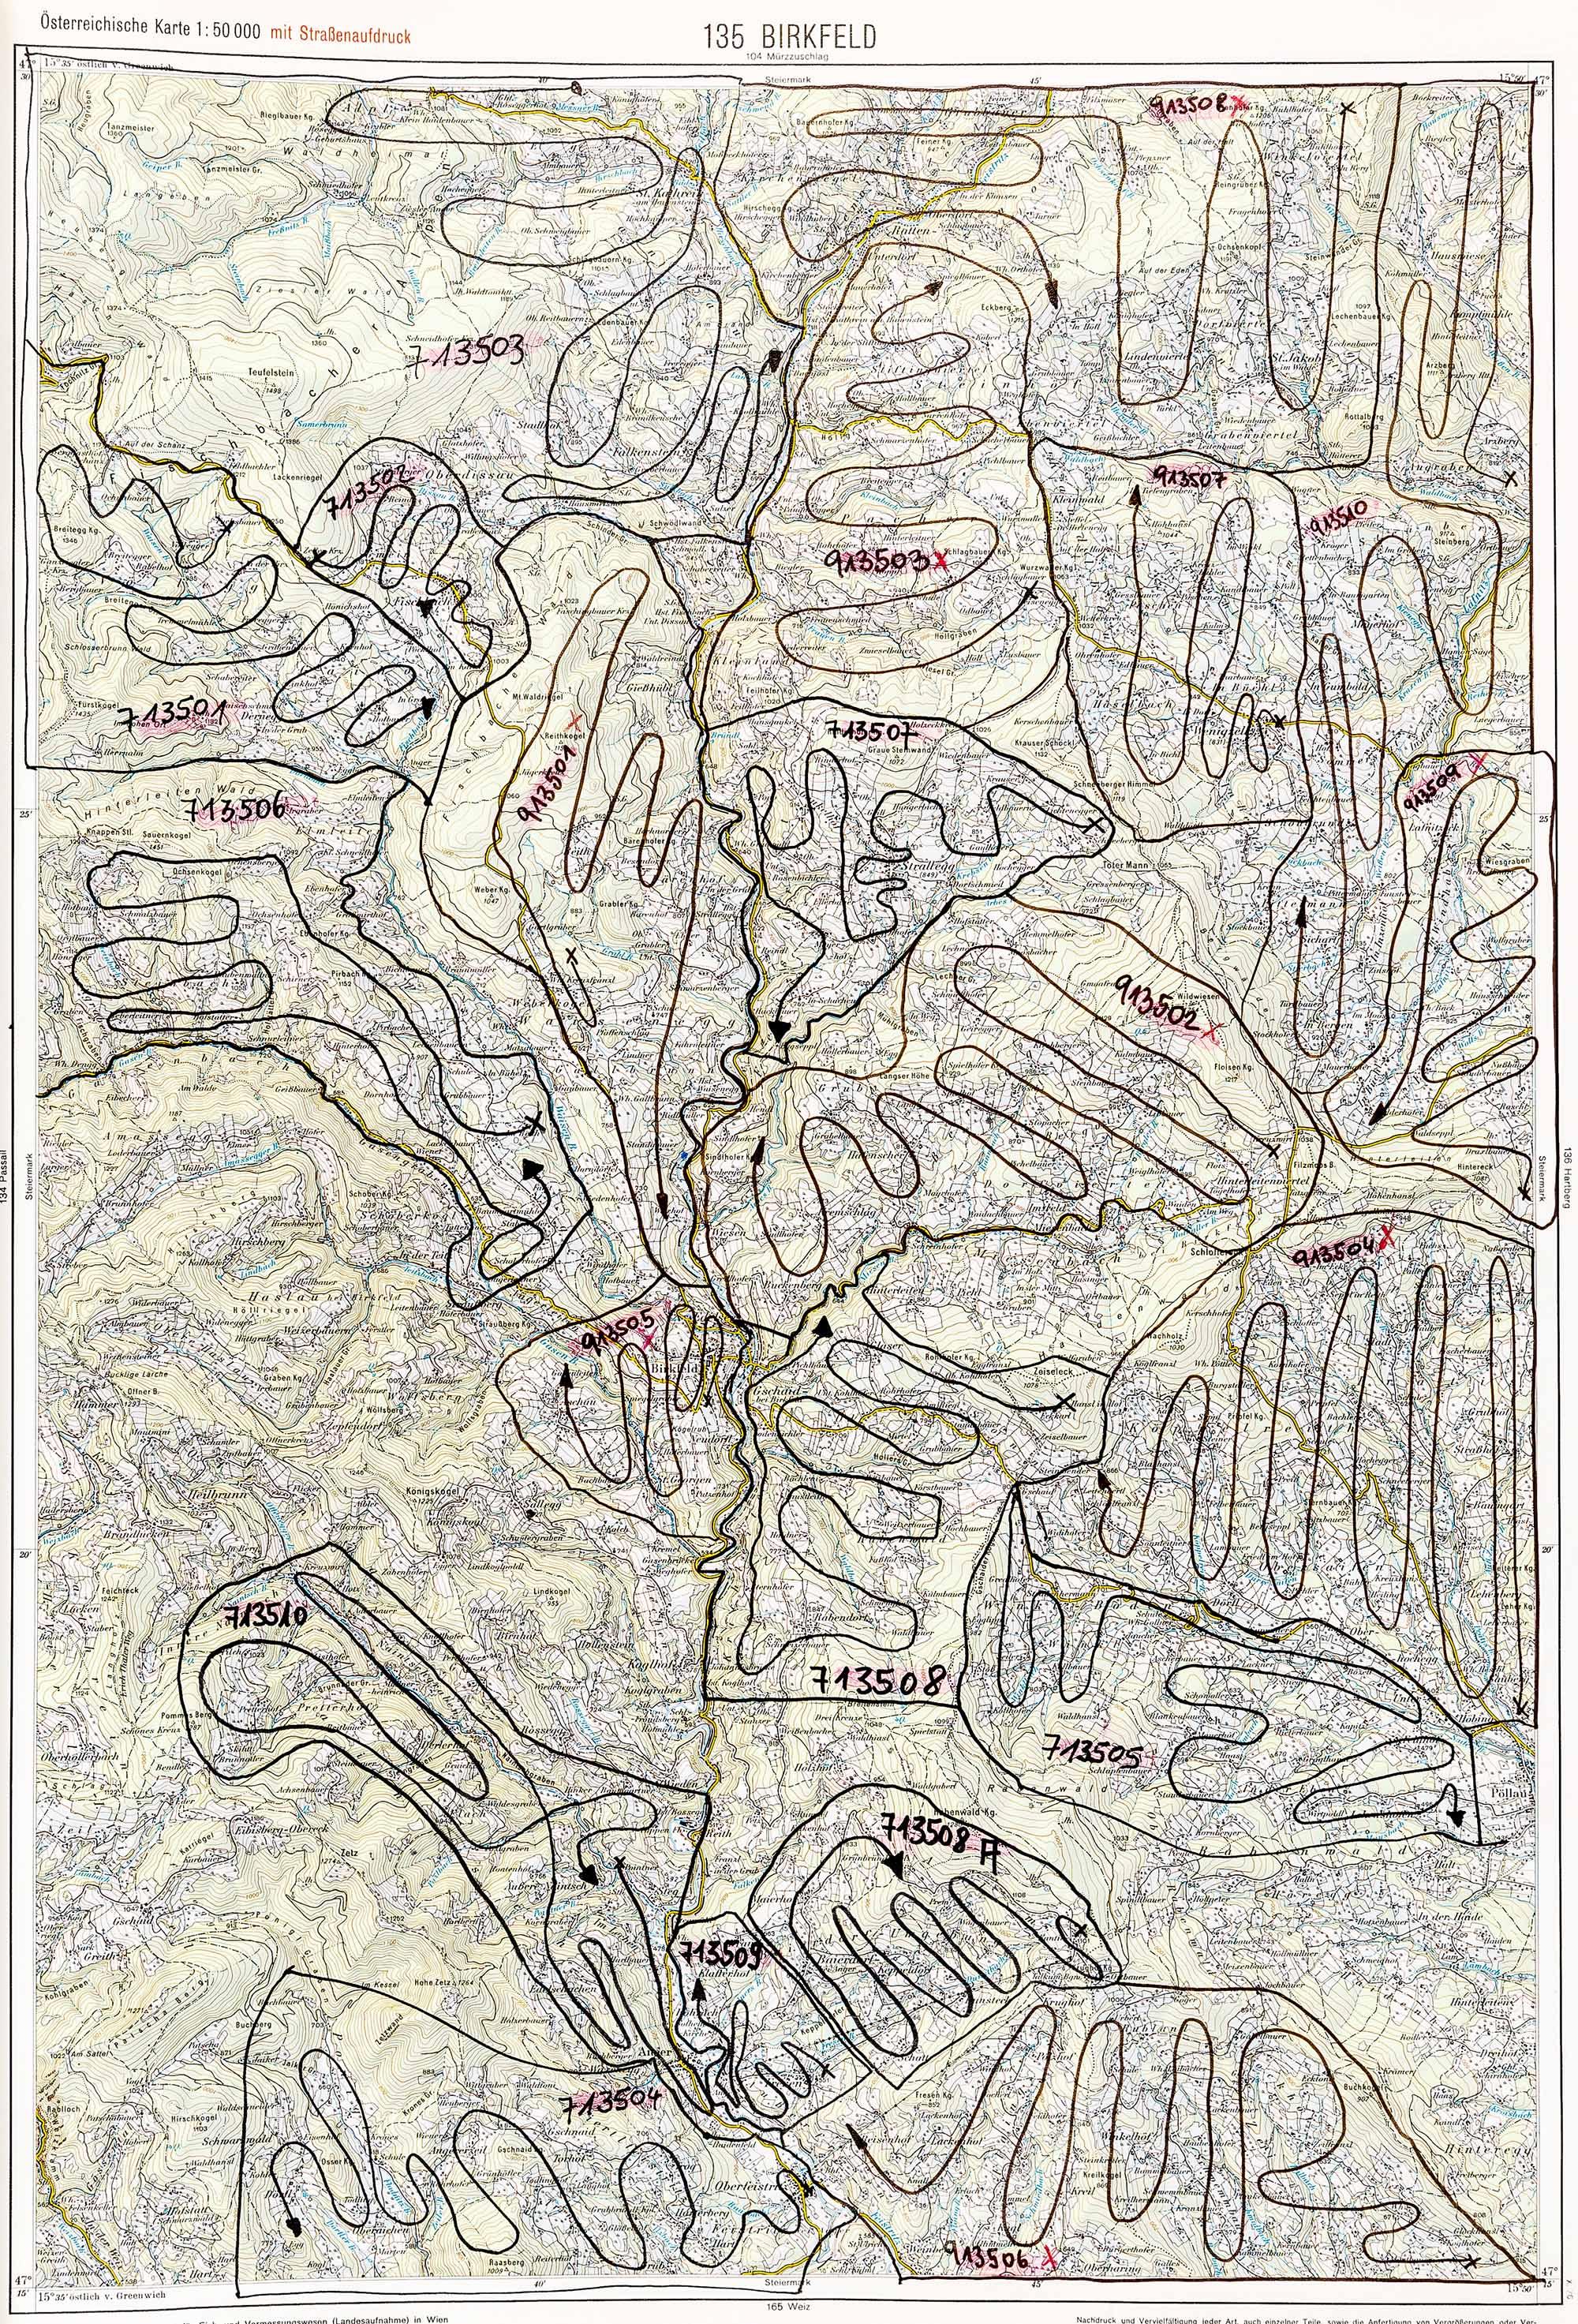 1975-1979 Karte 135